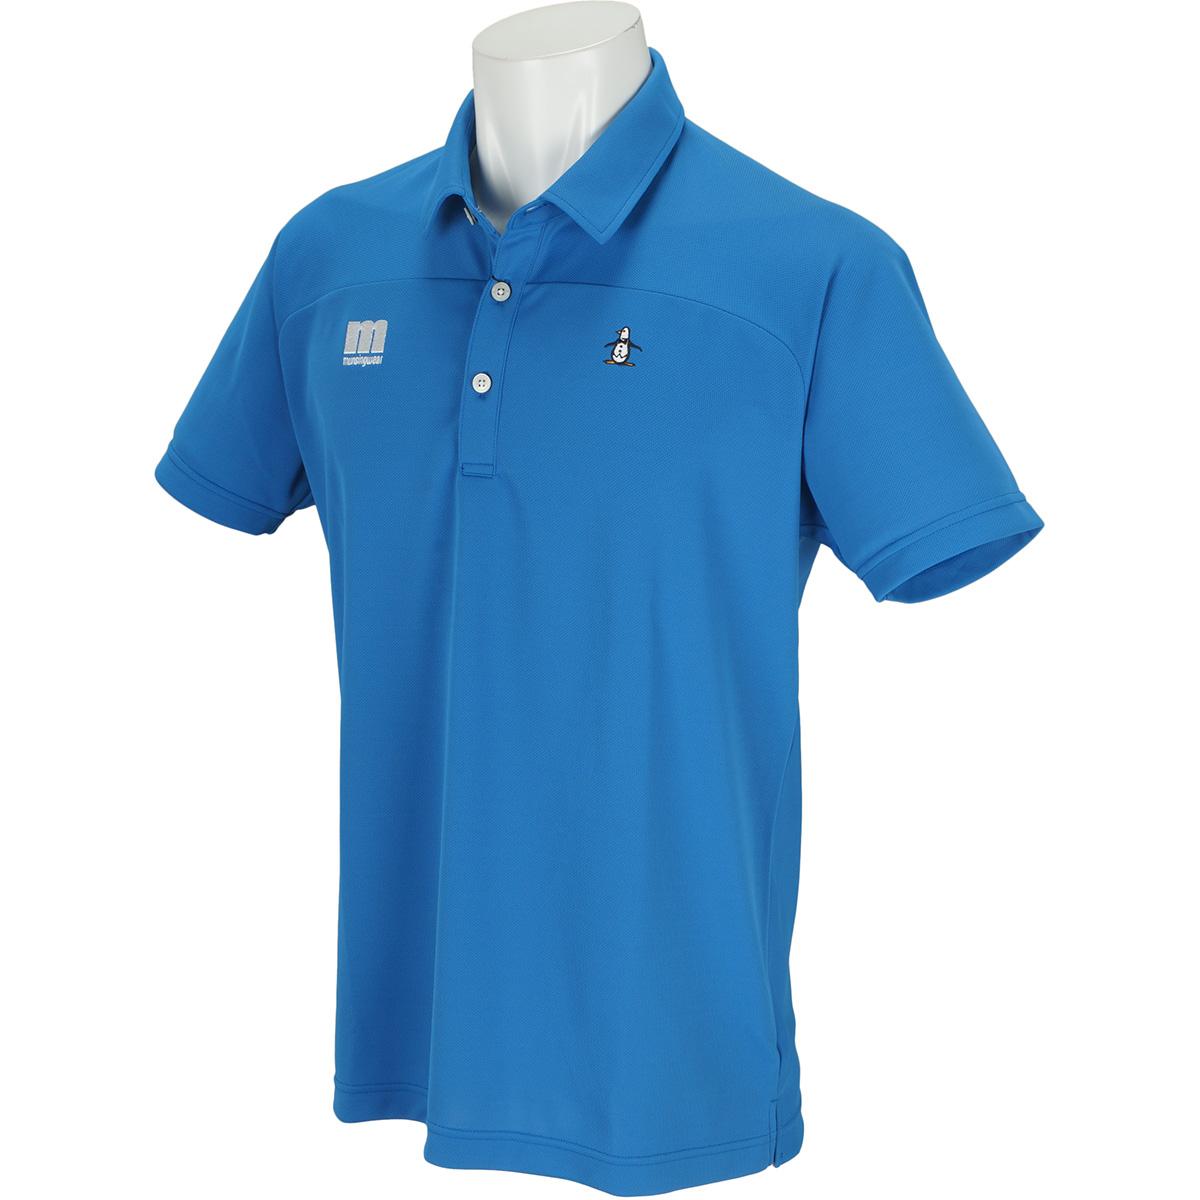 ENVOY SUNSCREEN カッティング半袖ポロシャツ